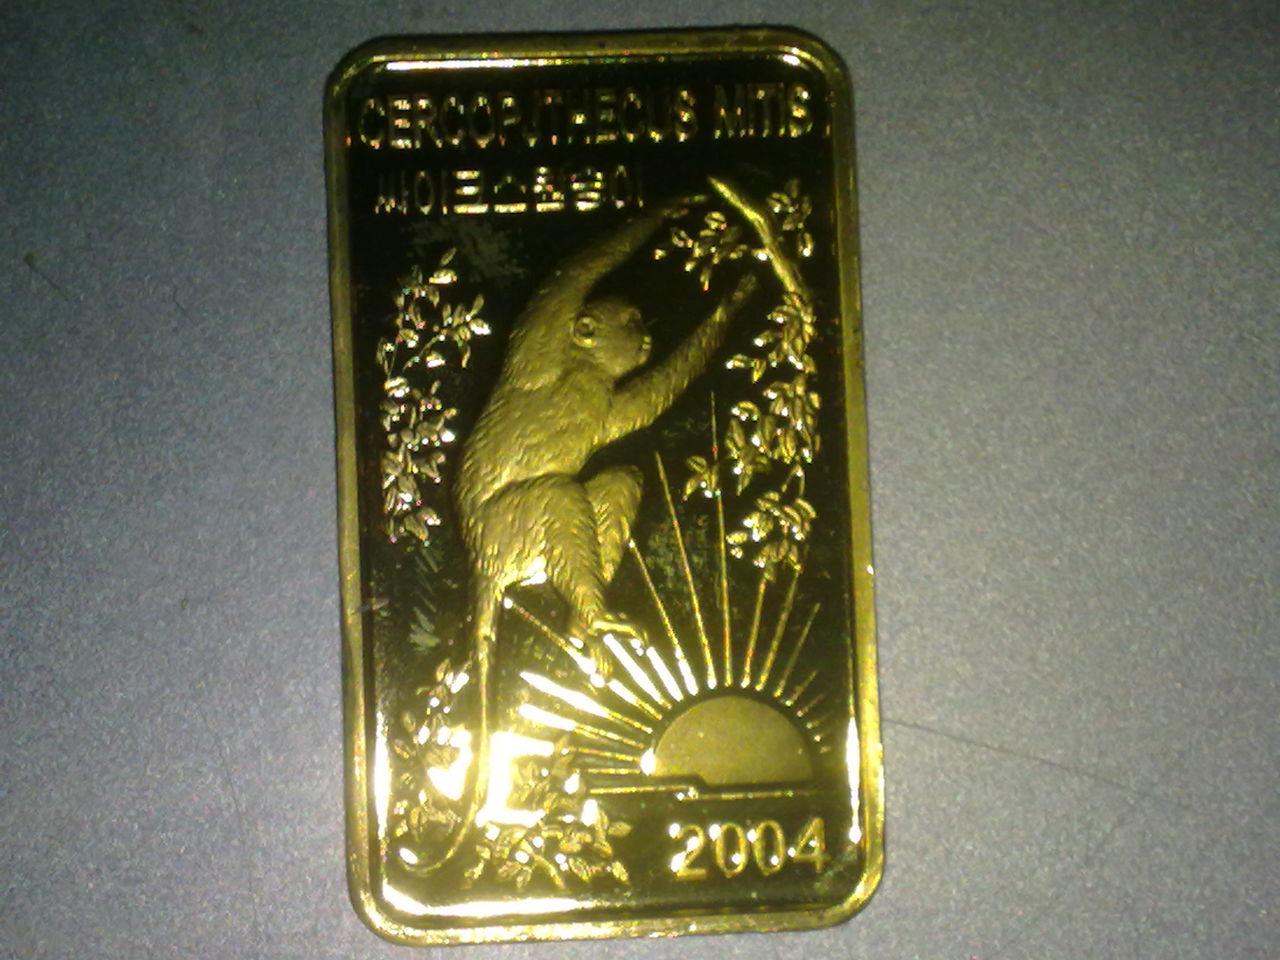 Monedas de Corea dedicadas a Emi... 006